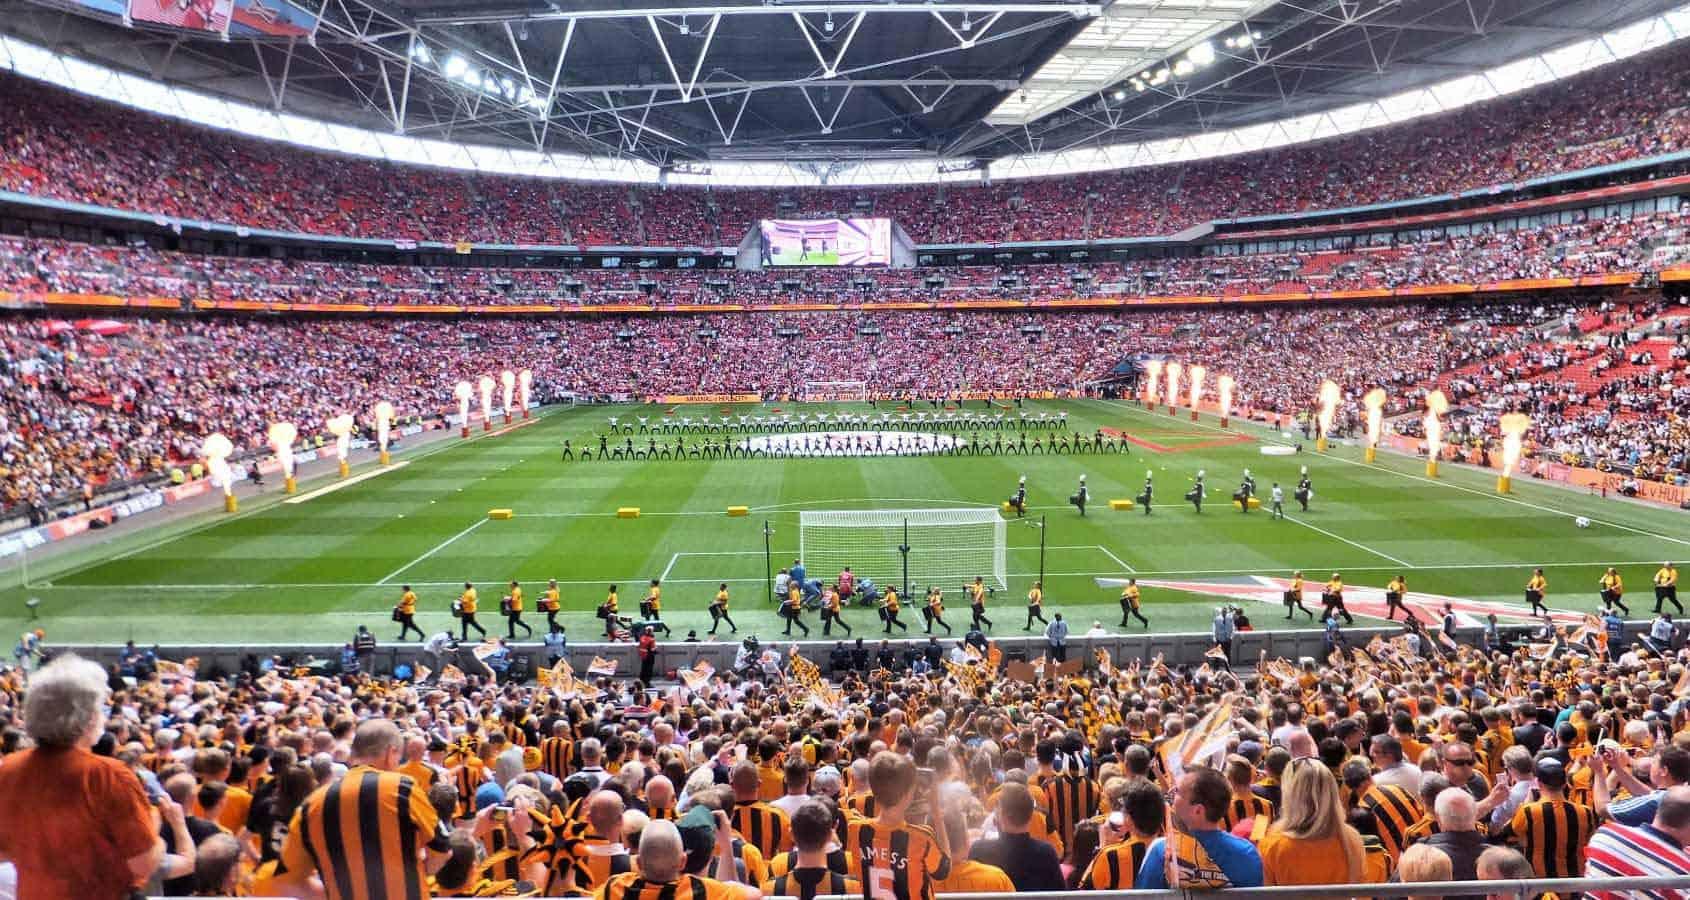 Fotbollsresor, FA Cup, Biljetter, Final